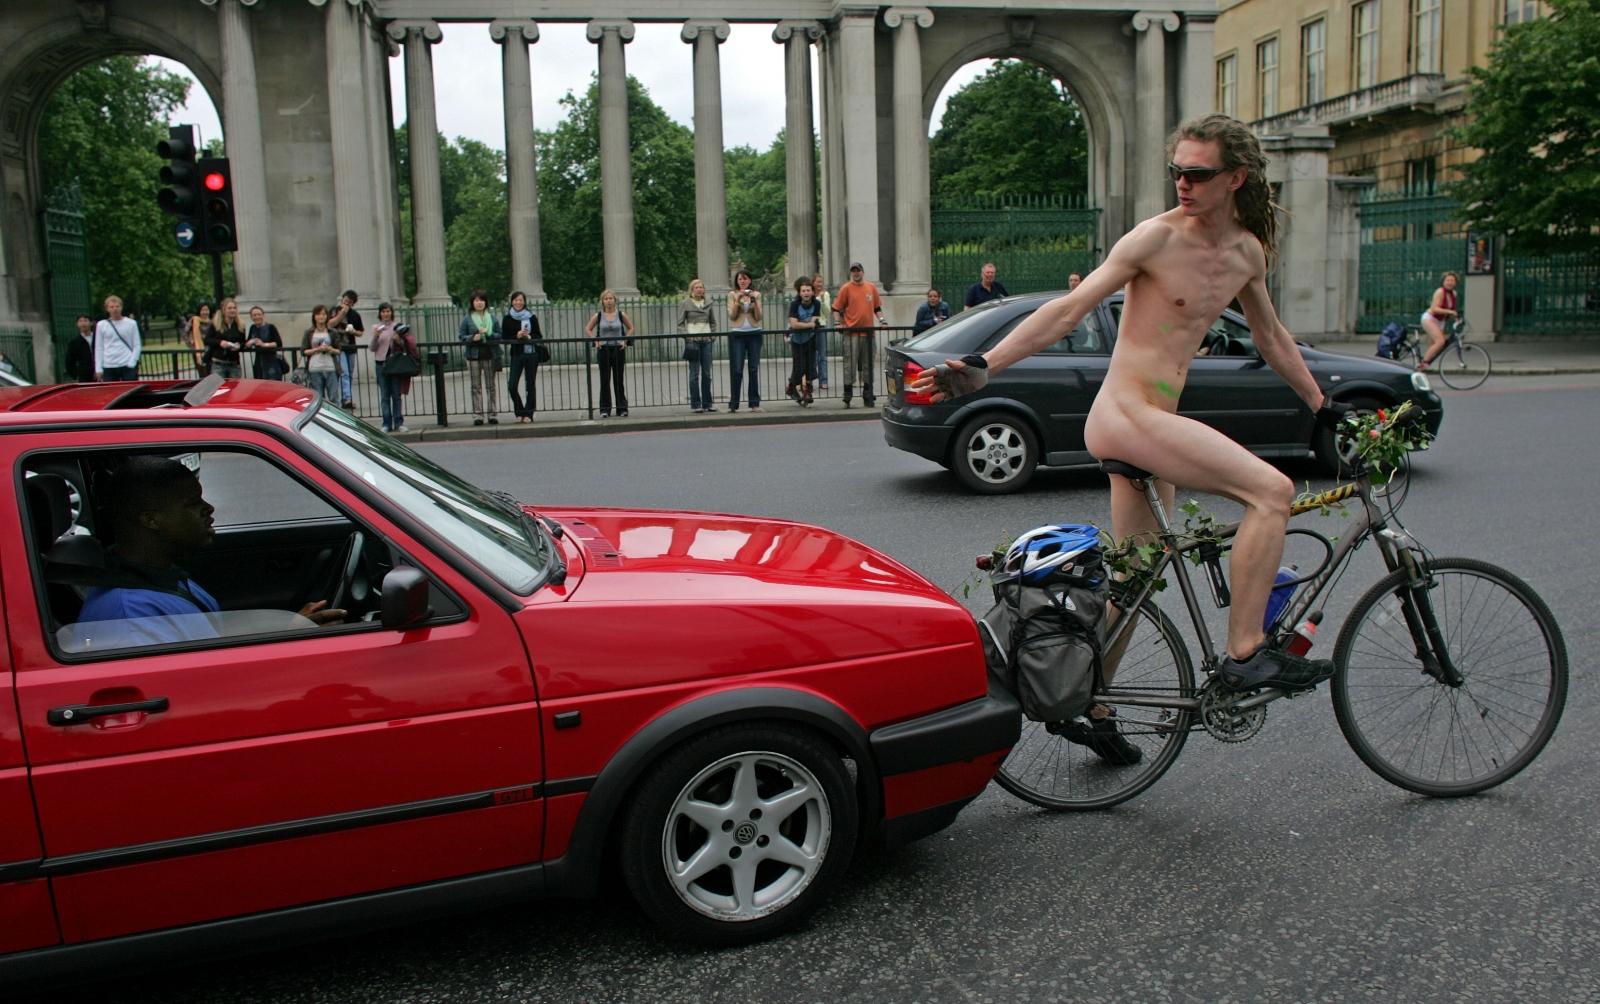 Naked Cycle London